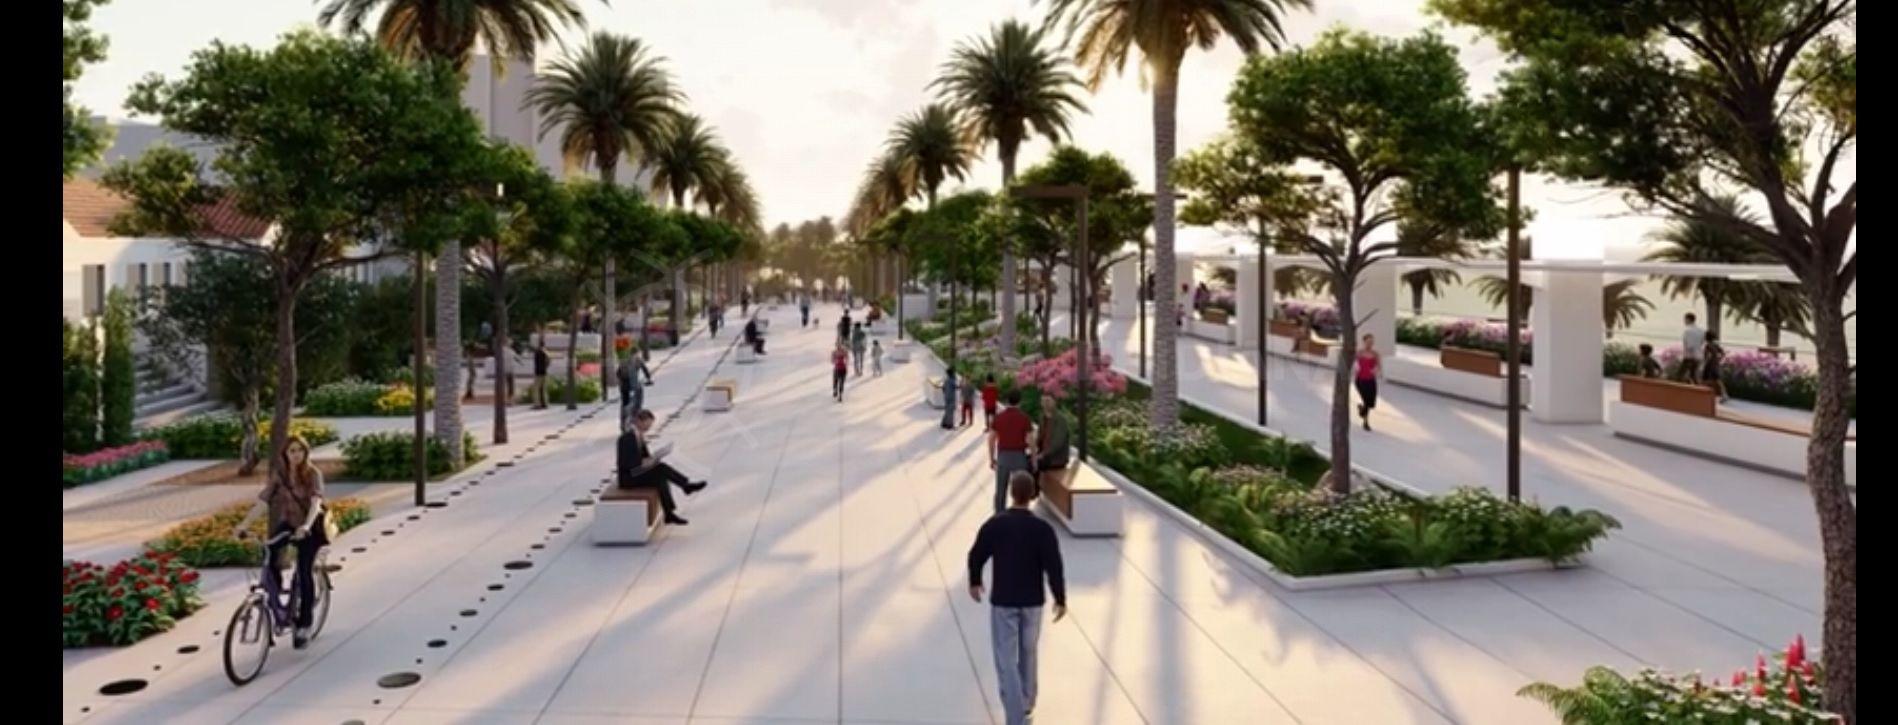 Estepona town hall presents project for beachside boulevard park